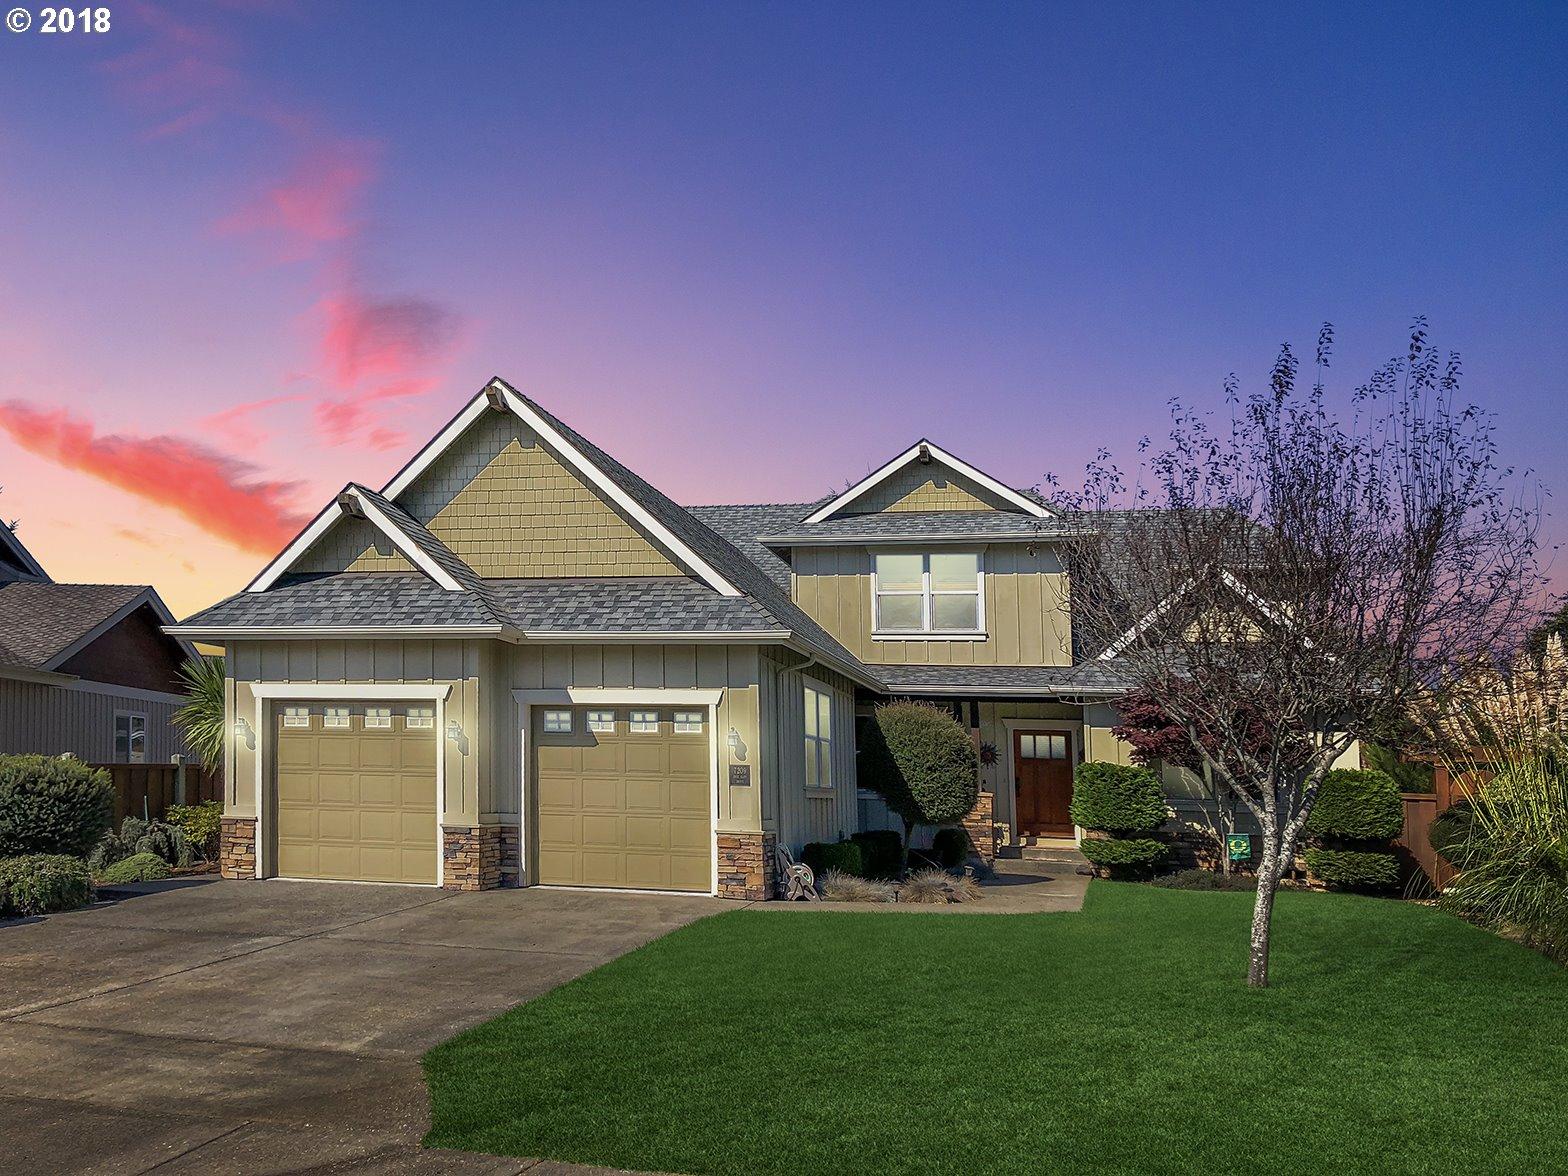 Brookings, OR 3 Bedroom Home For Sale